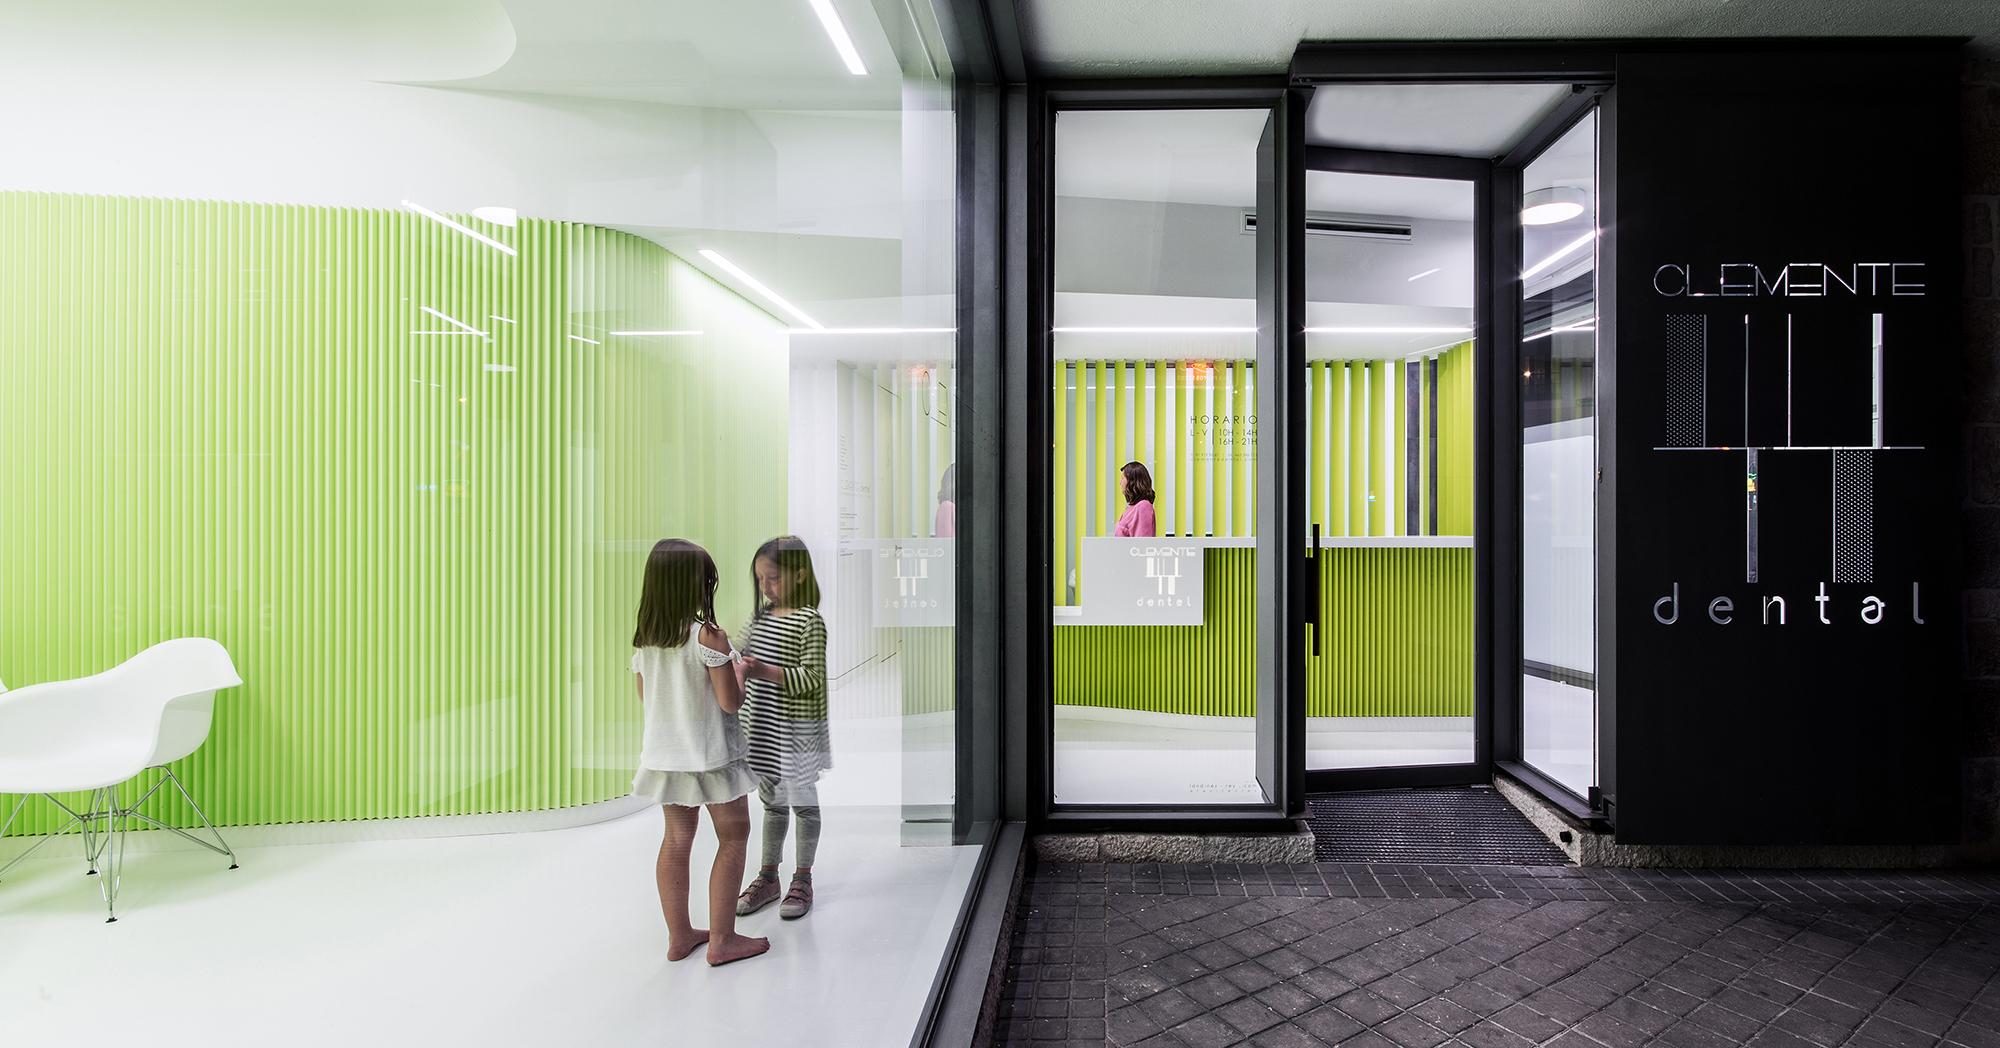 CLINICA CLEMENTE dental - LANDÍNEZ+REY arquitectos - arquitectura retail - interiorismo noche